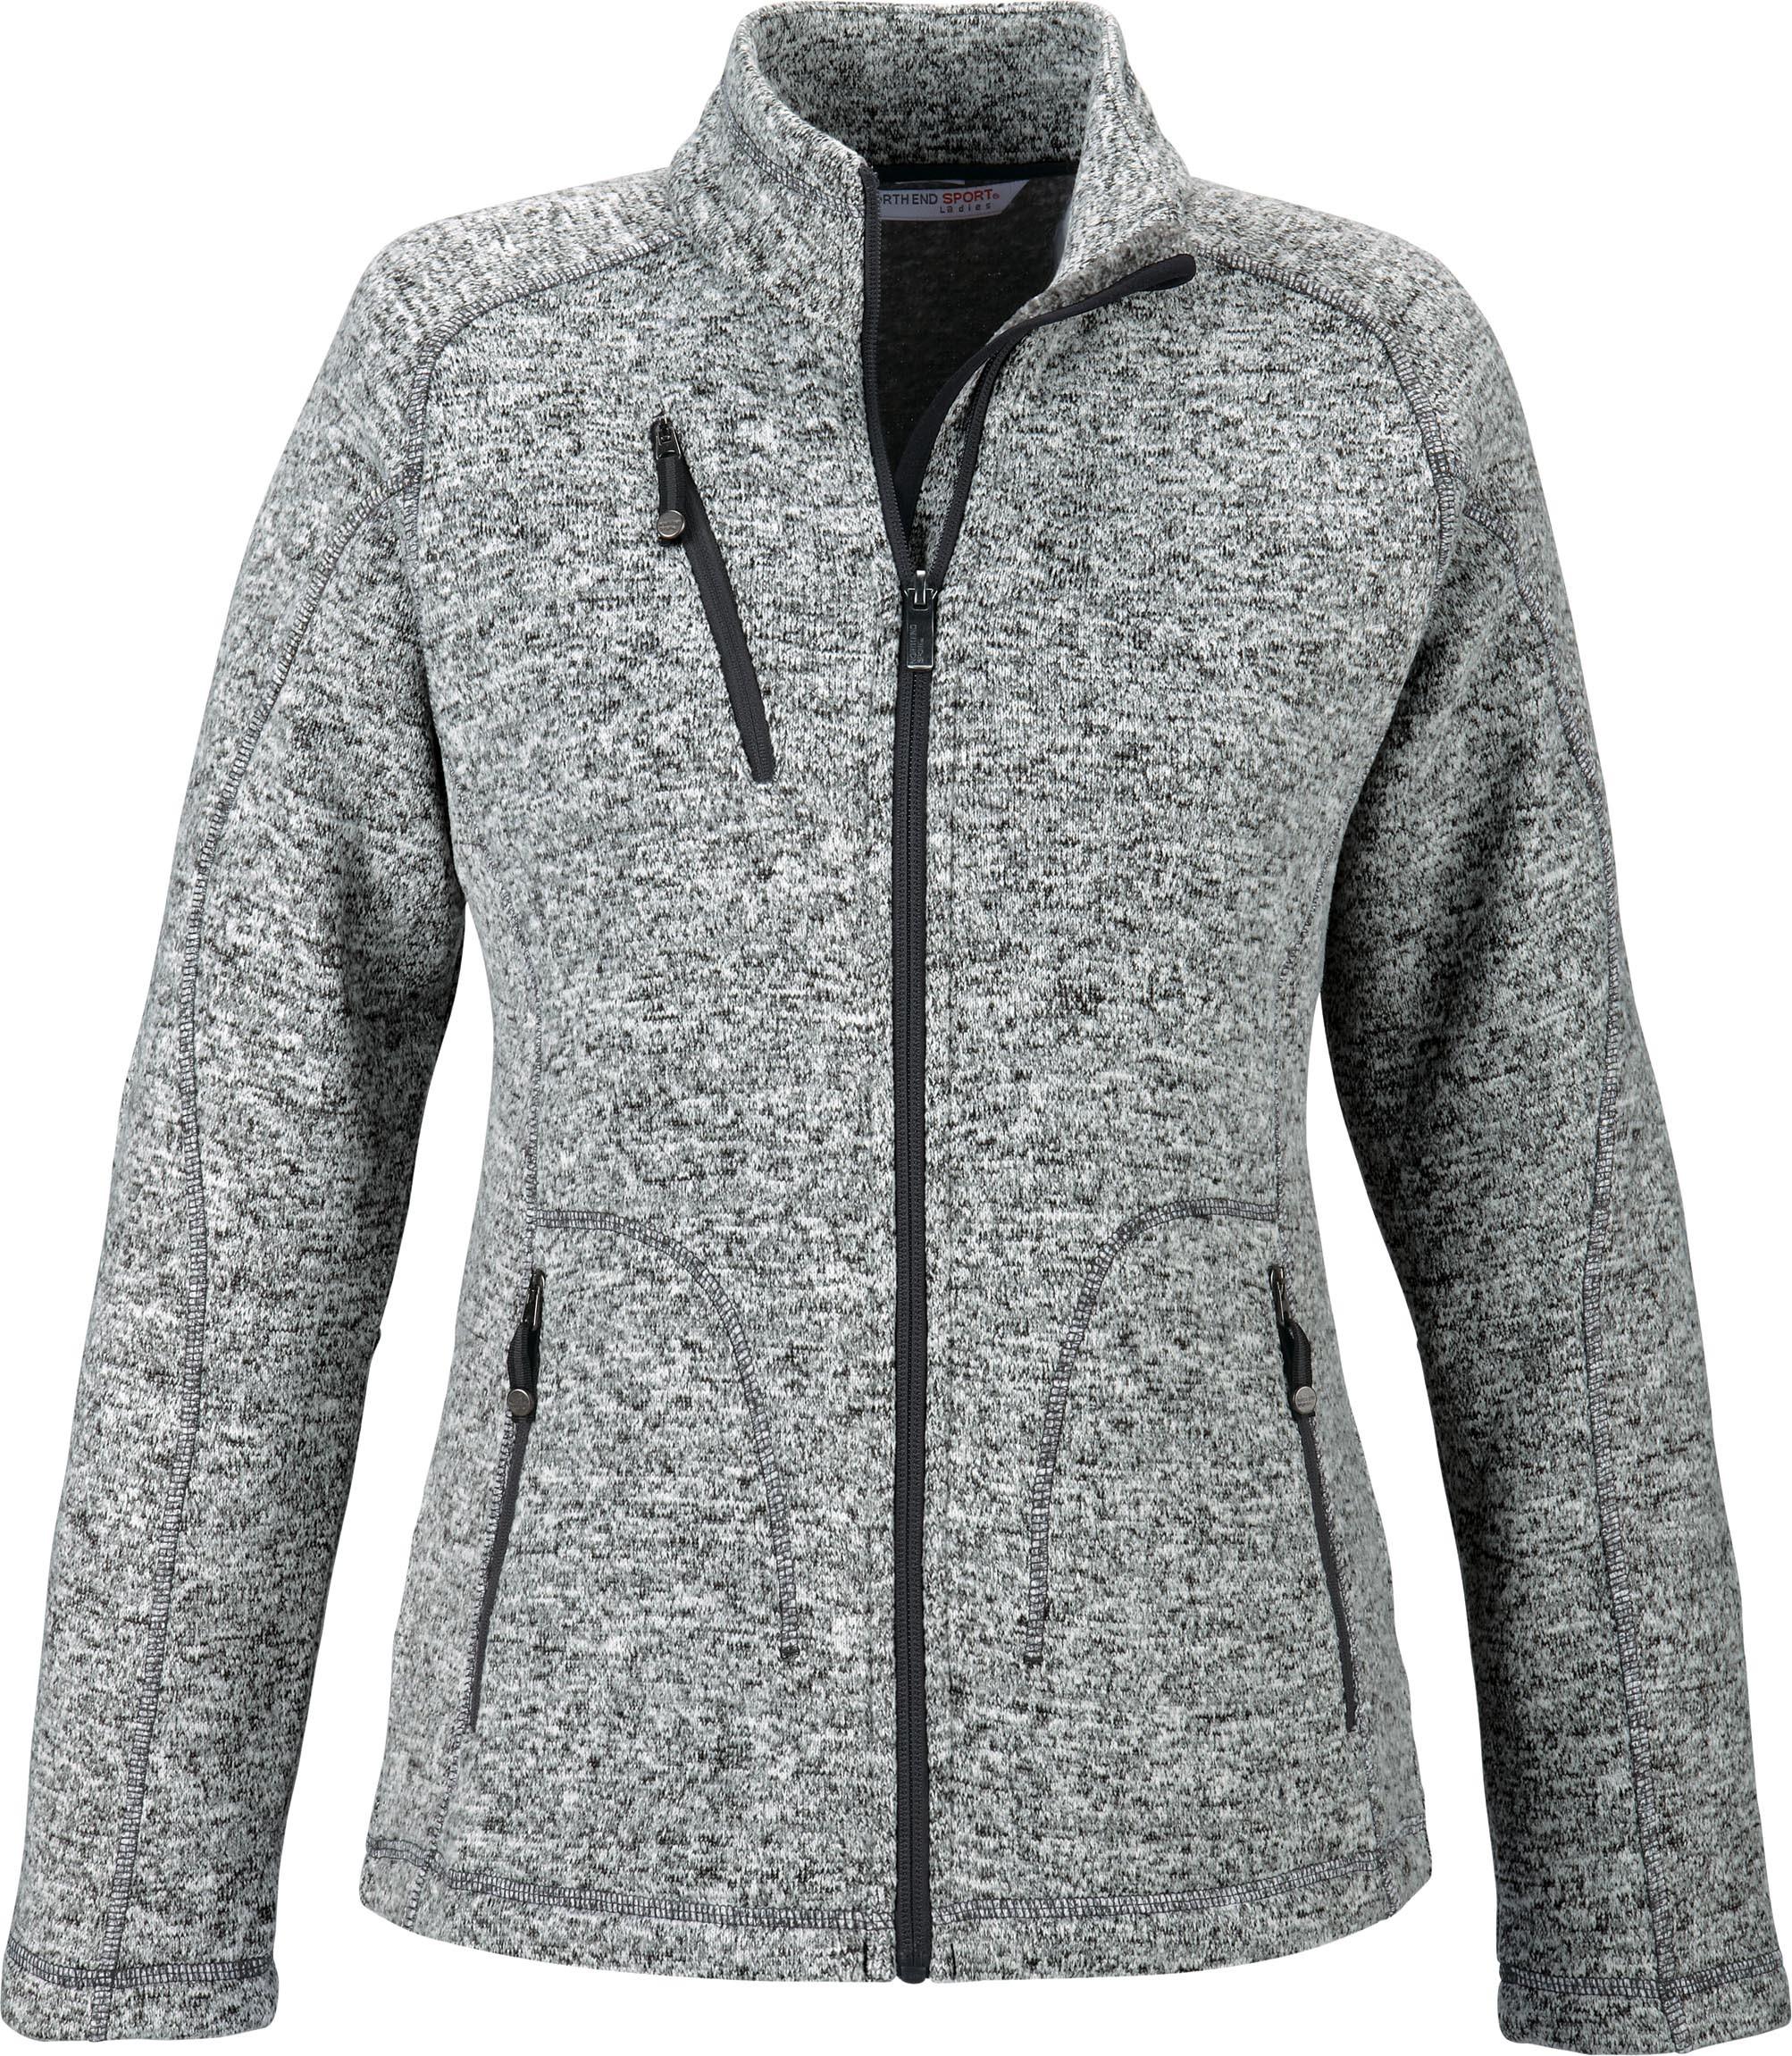 Ash City Poly Fleece 78669 - Peak Ladies' Sweater Fleece ...